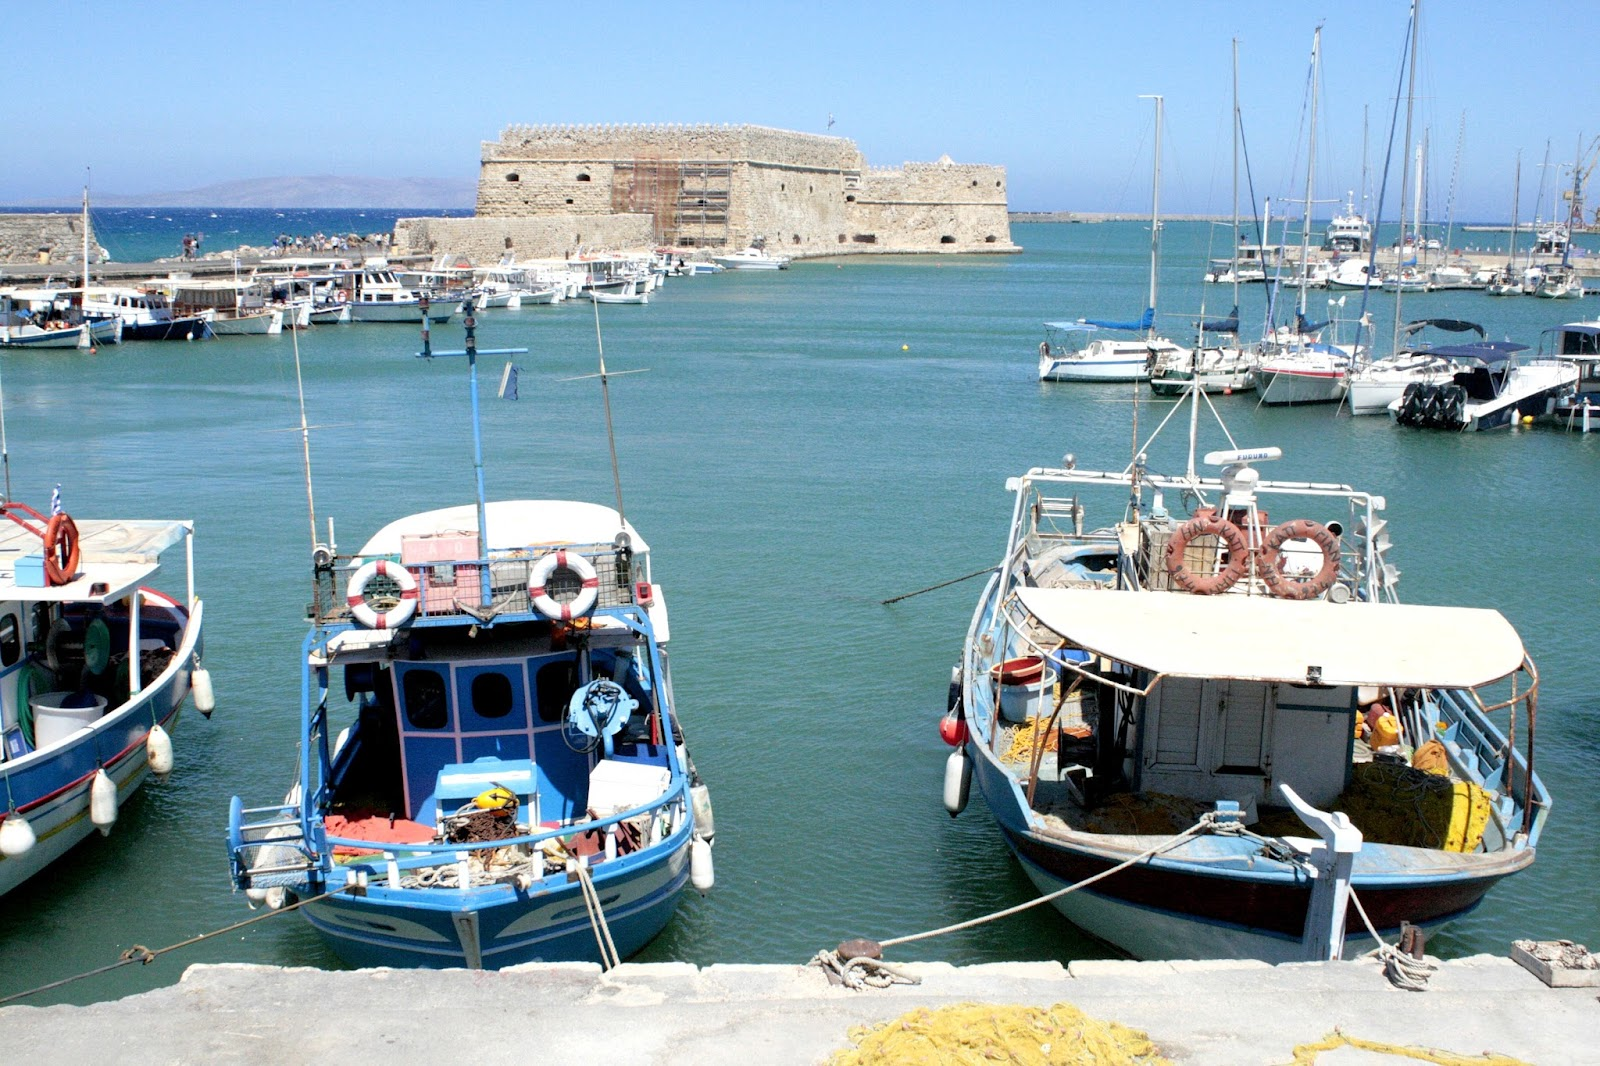 Unser Kreta Urlaub 2014